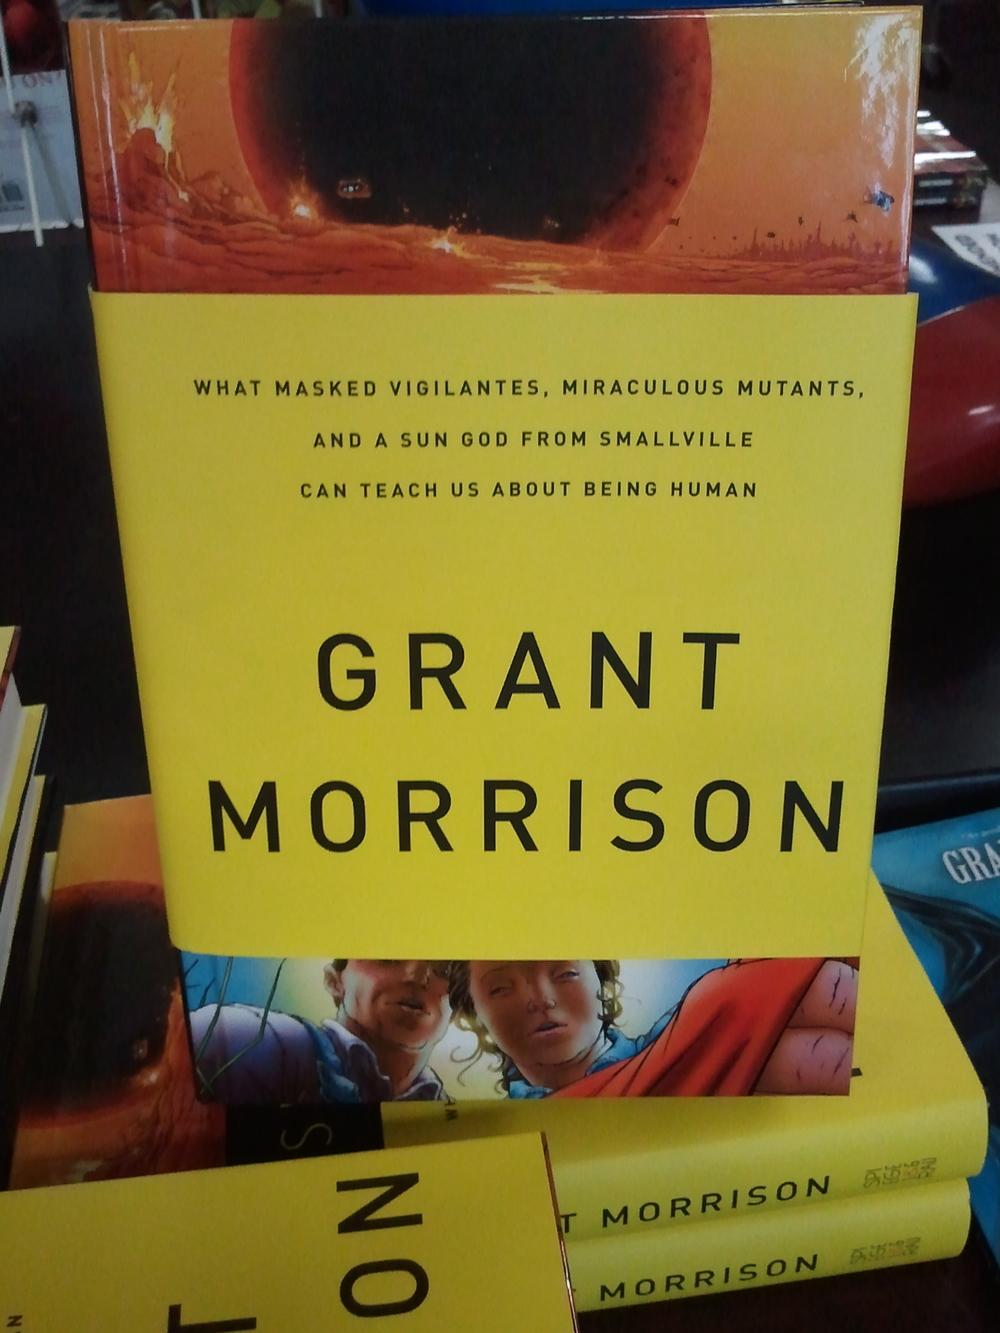 Grant Morrison Book Signing